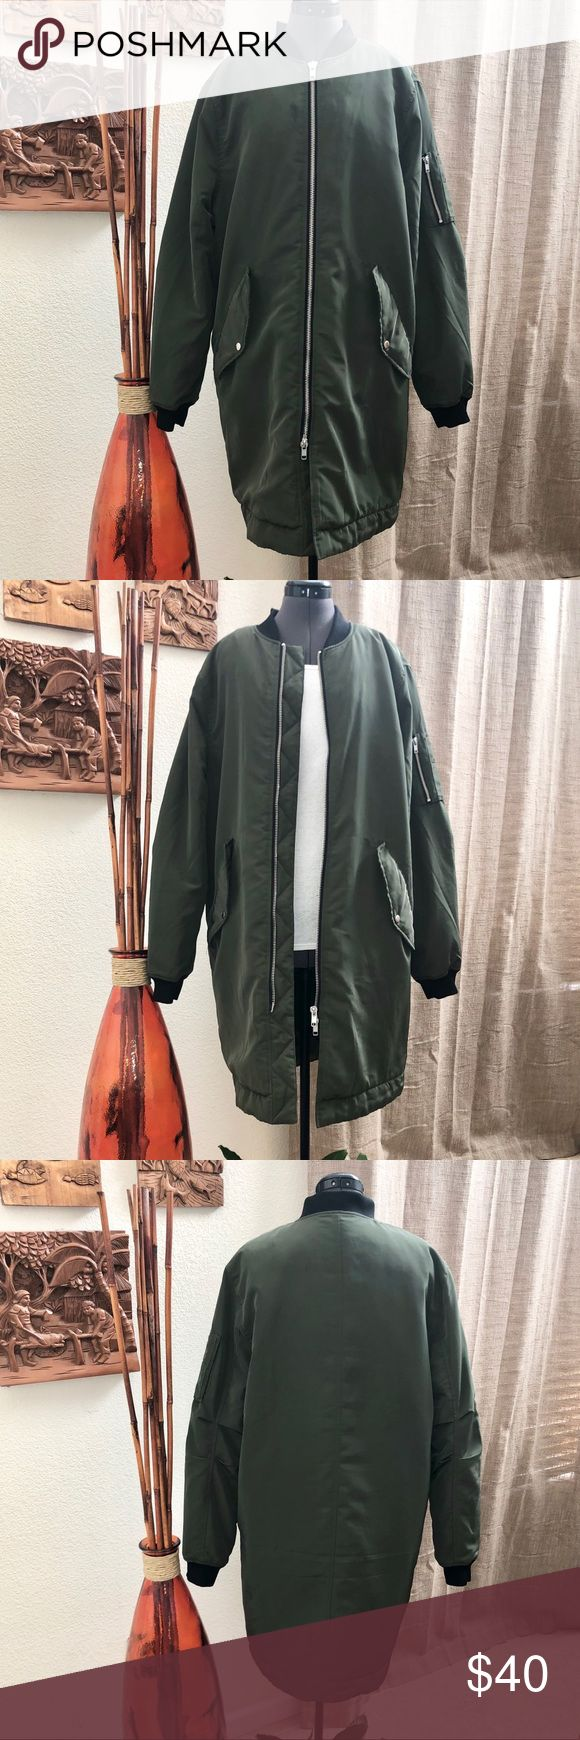 H&M Men's Coat (With images) Men s coat, Jacket design